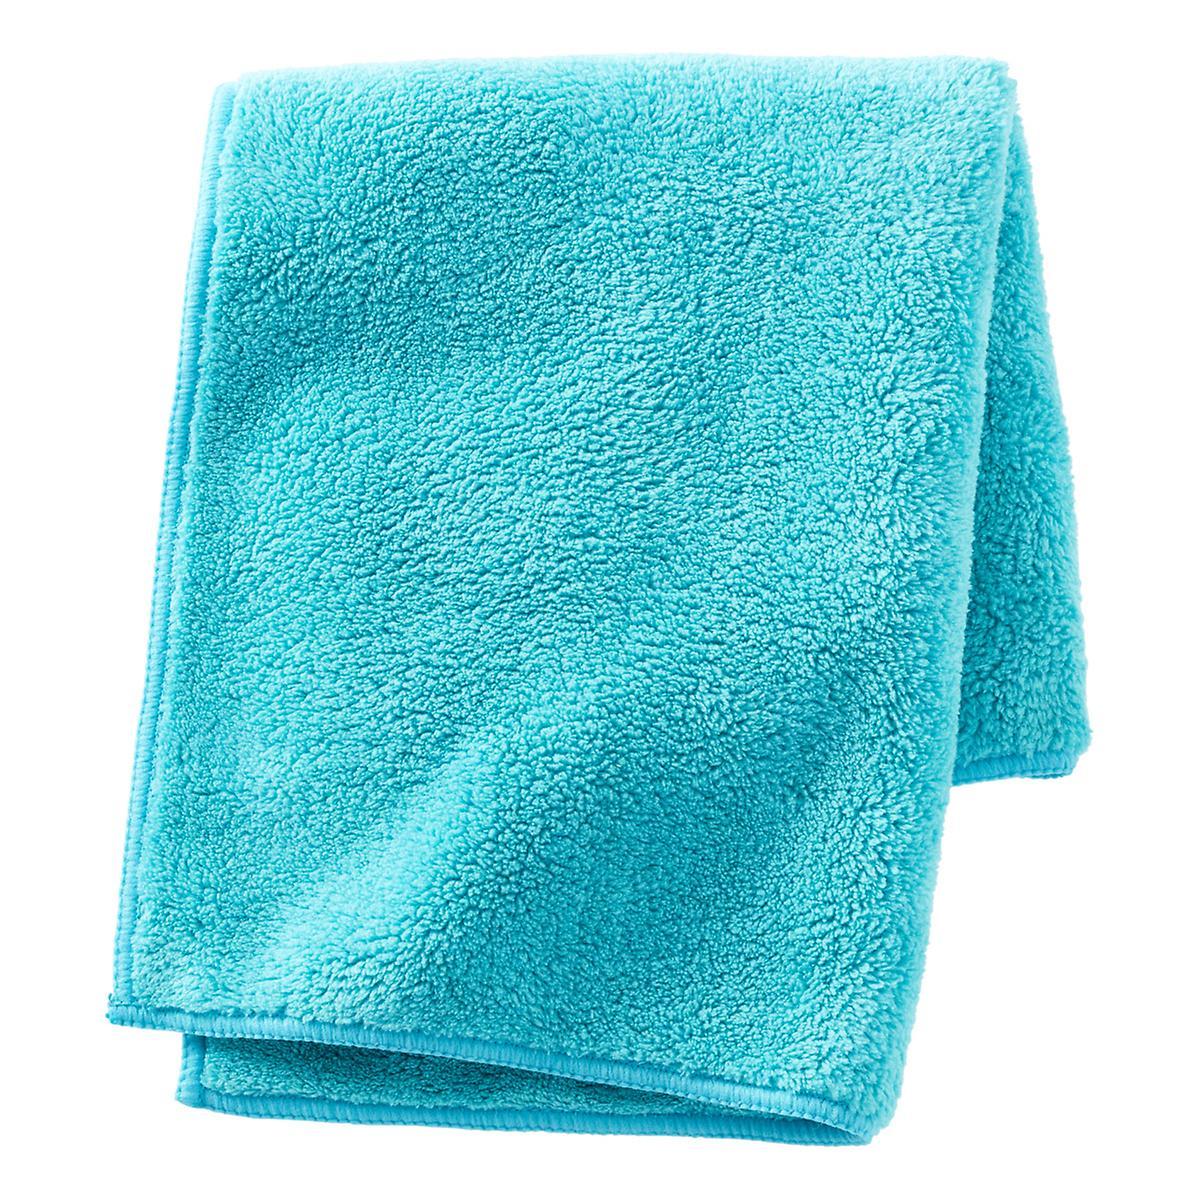 Casabella Microfiber Dusting Cloths